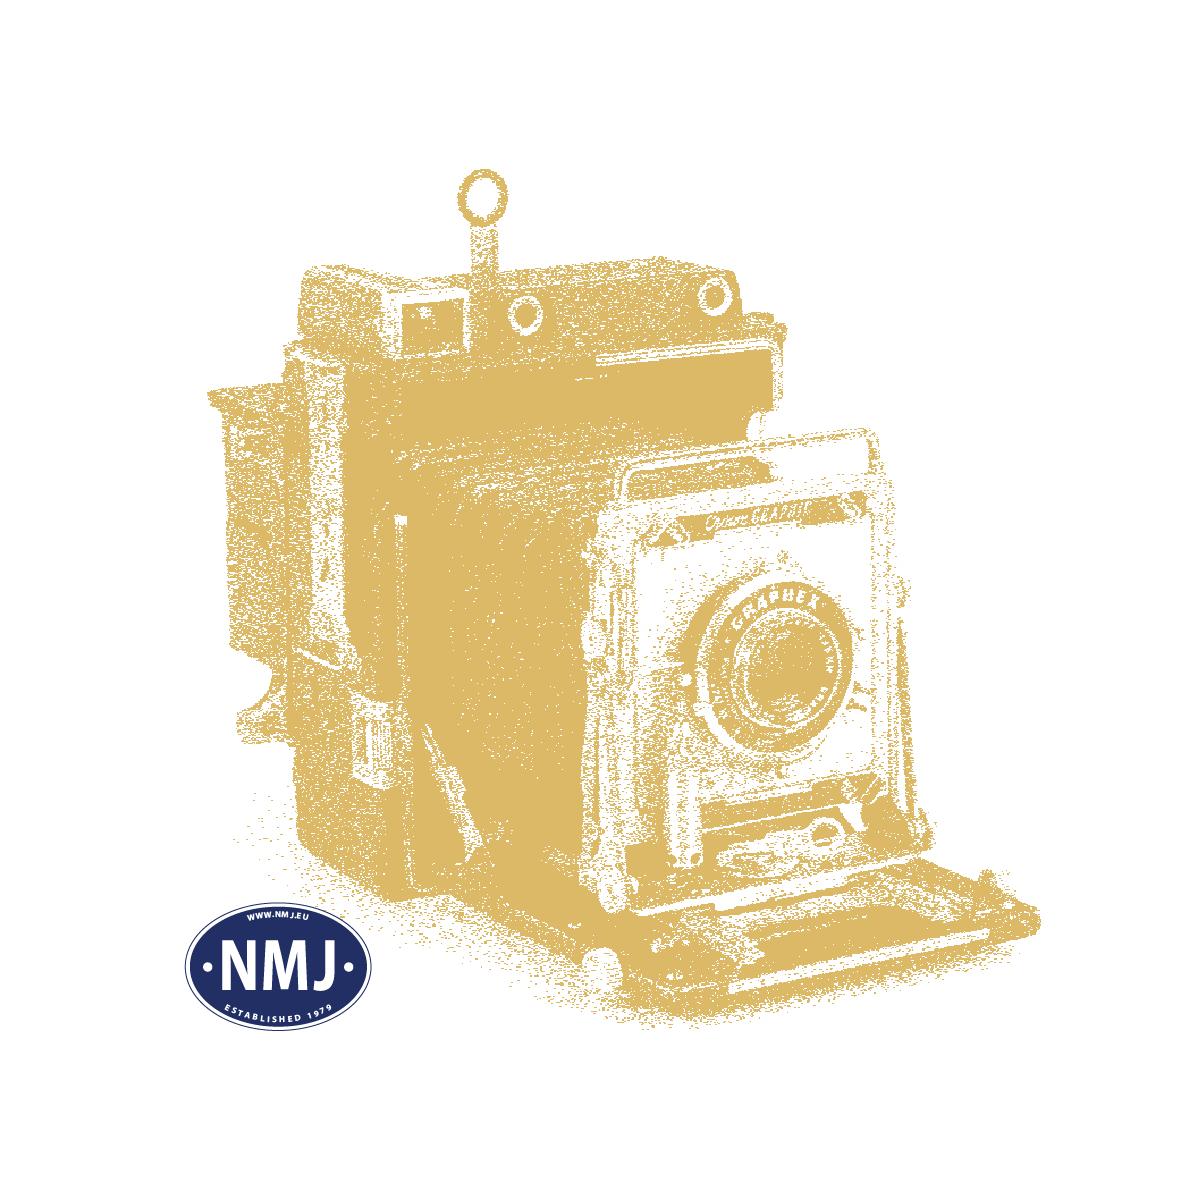 NMJT106.501 - NMJ Topline NSB B3-6 25651